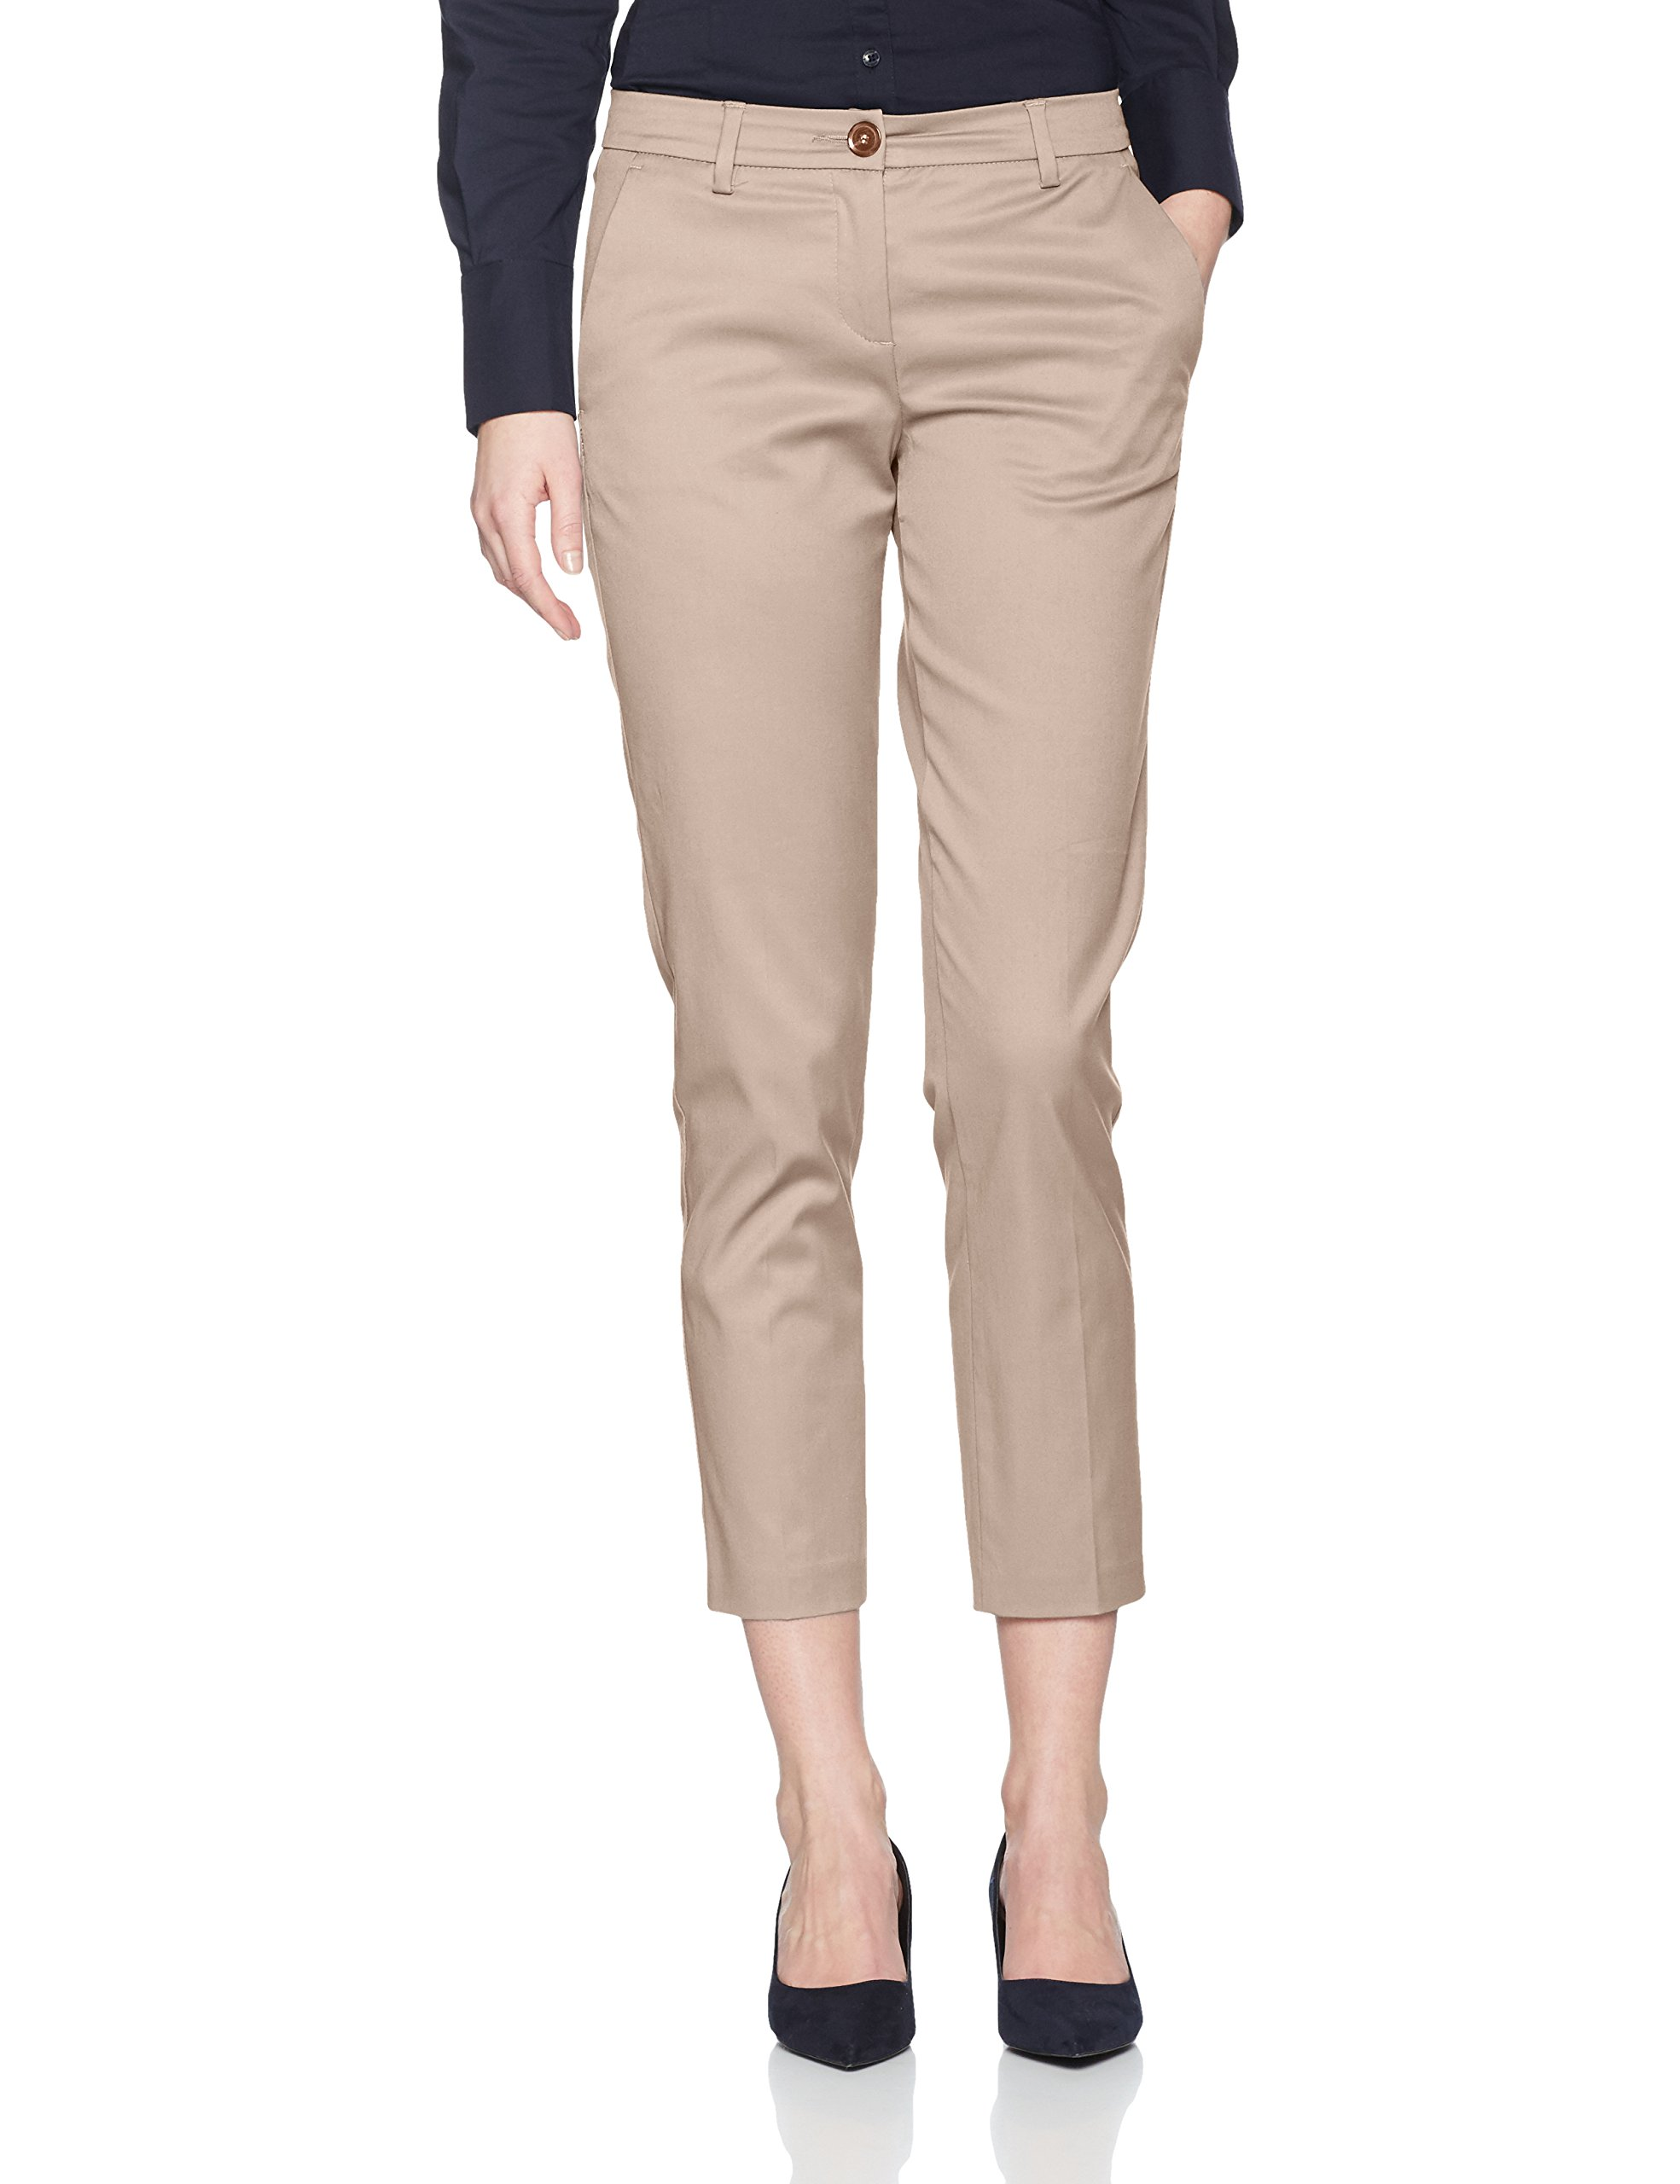 United Colors of Benetton Slim Fit Smart Trouser Pantalones para Mujer